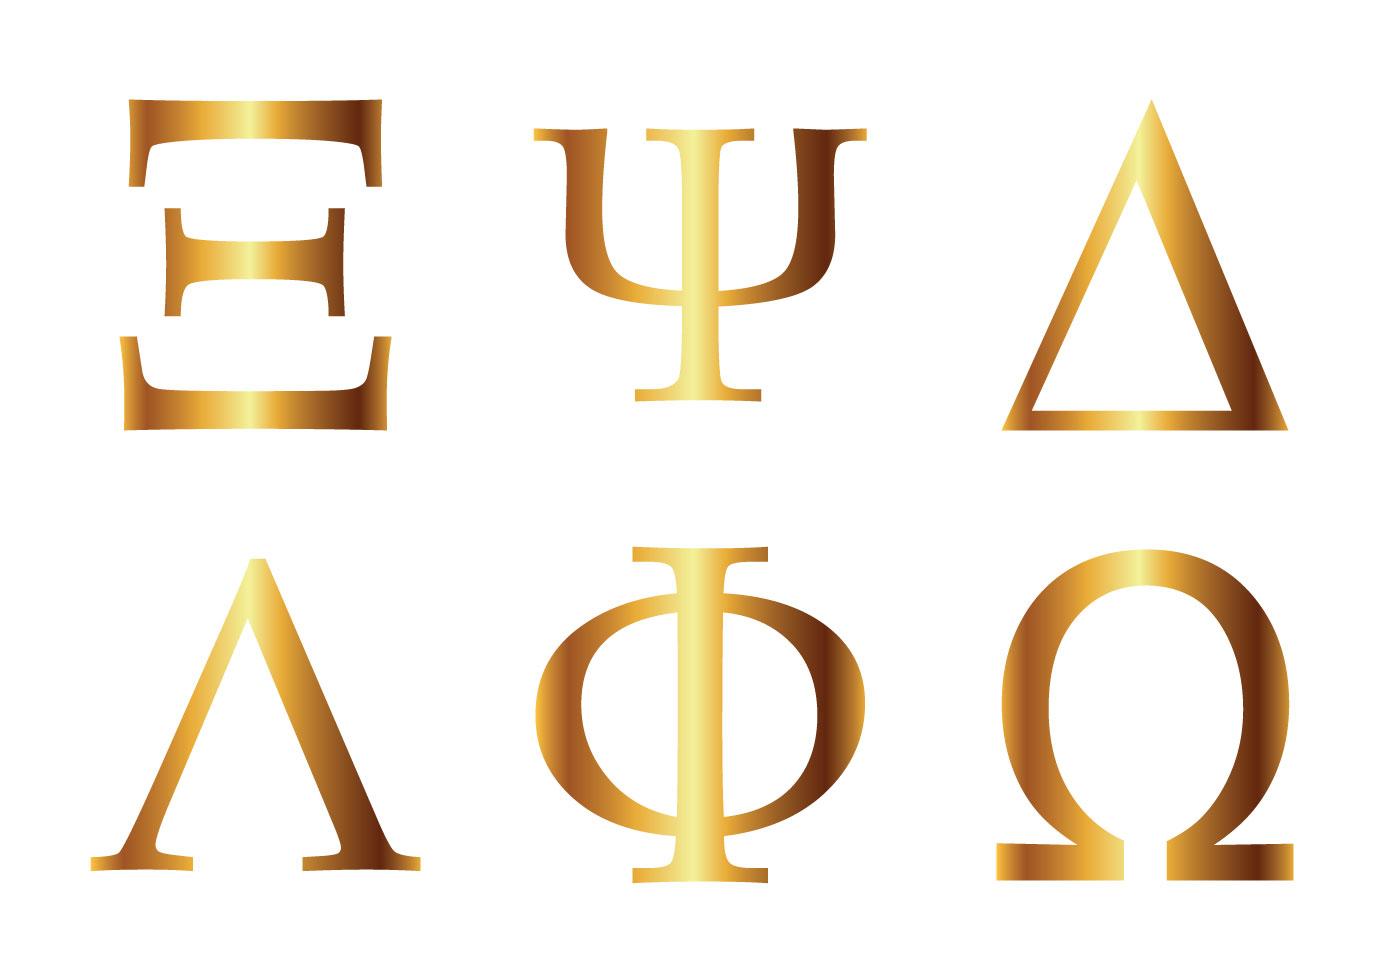 Greek alphabet clipart banner transparent download Gold Greek Alphabet - Download Free Vector Art, Stock Graphics ... banner transparent download